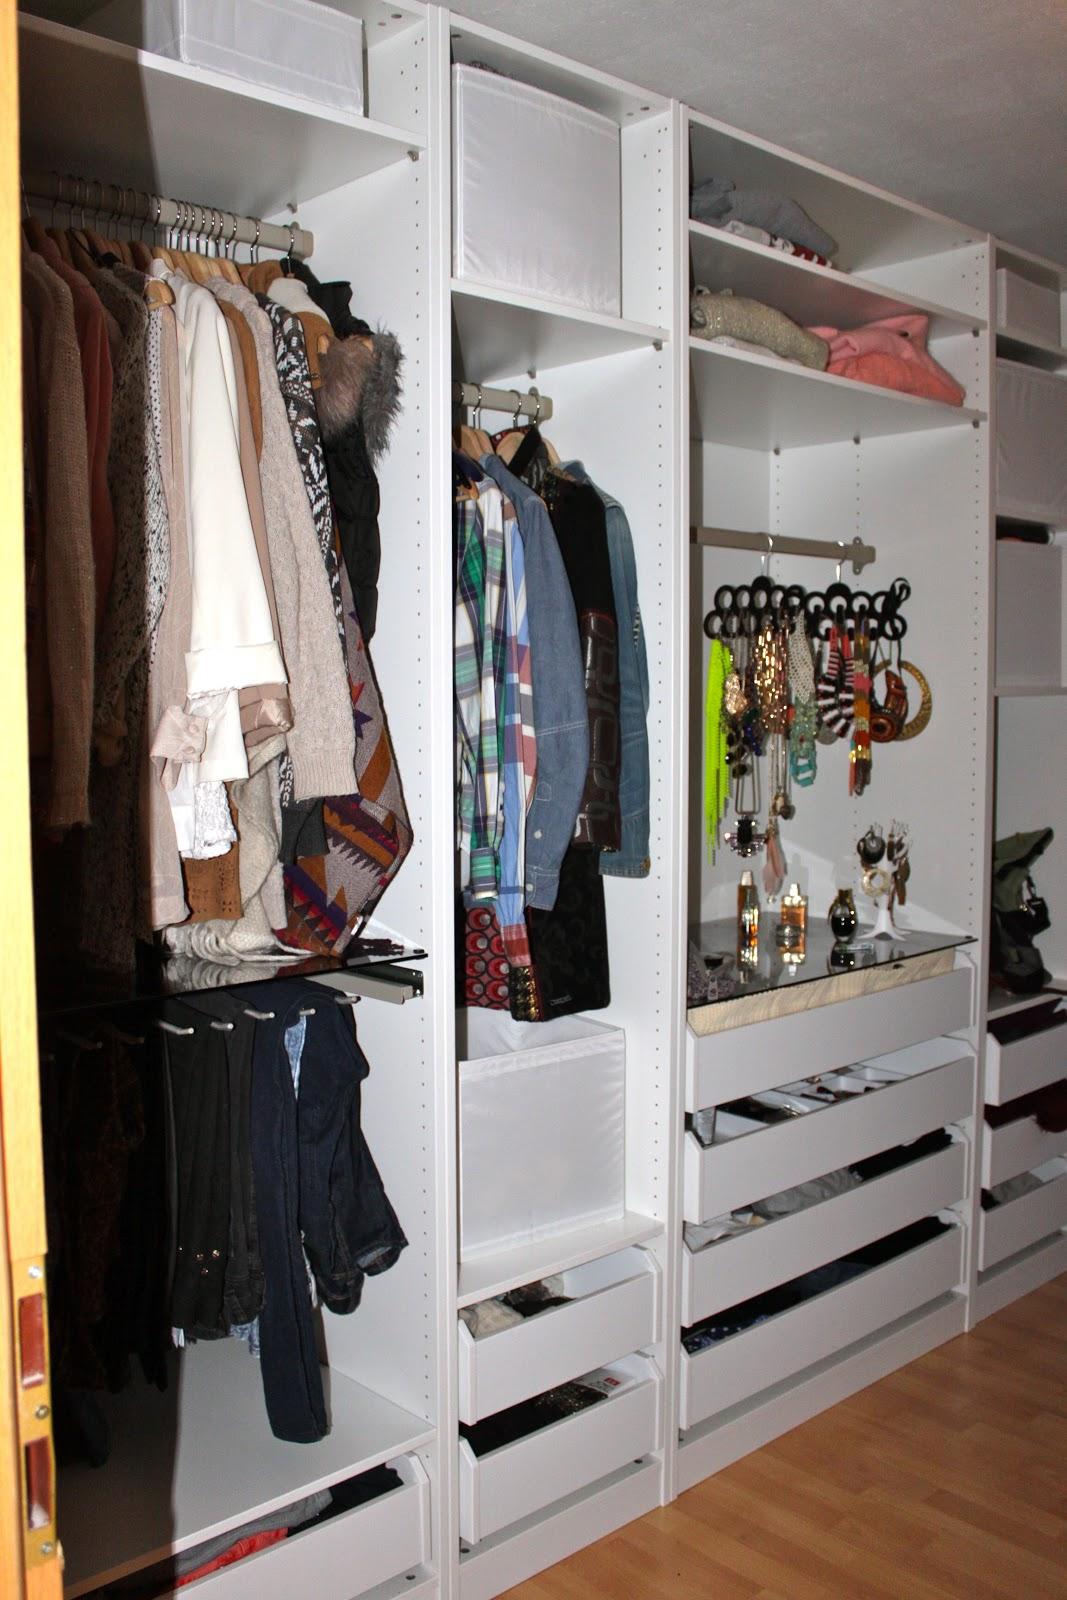 fashion art tricota februar 2013. Black Bedroom Furniture Sets. Home Design Ideas